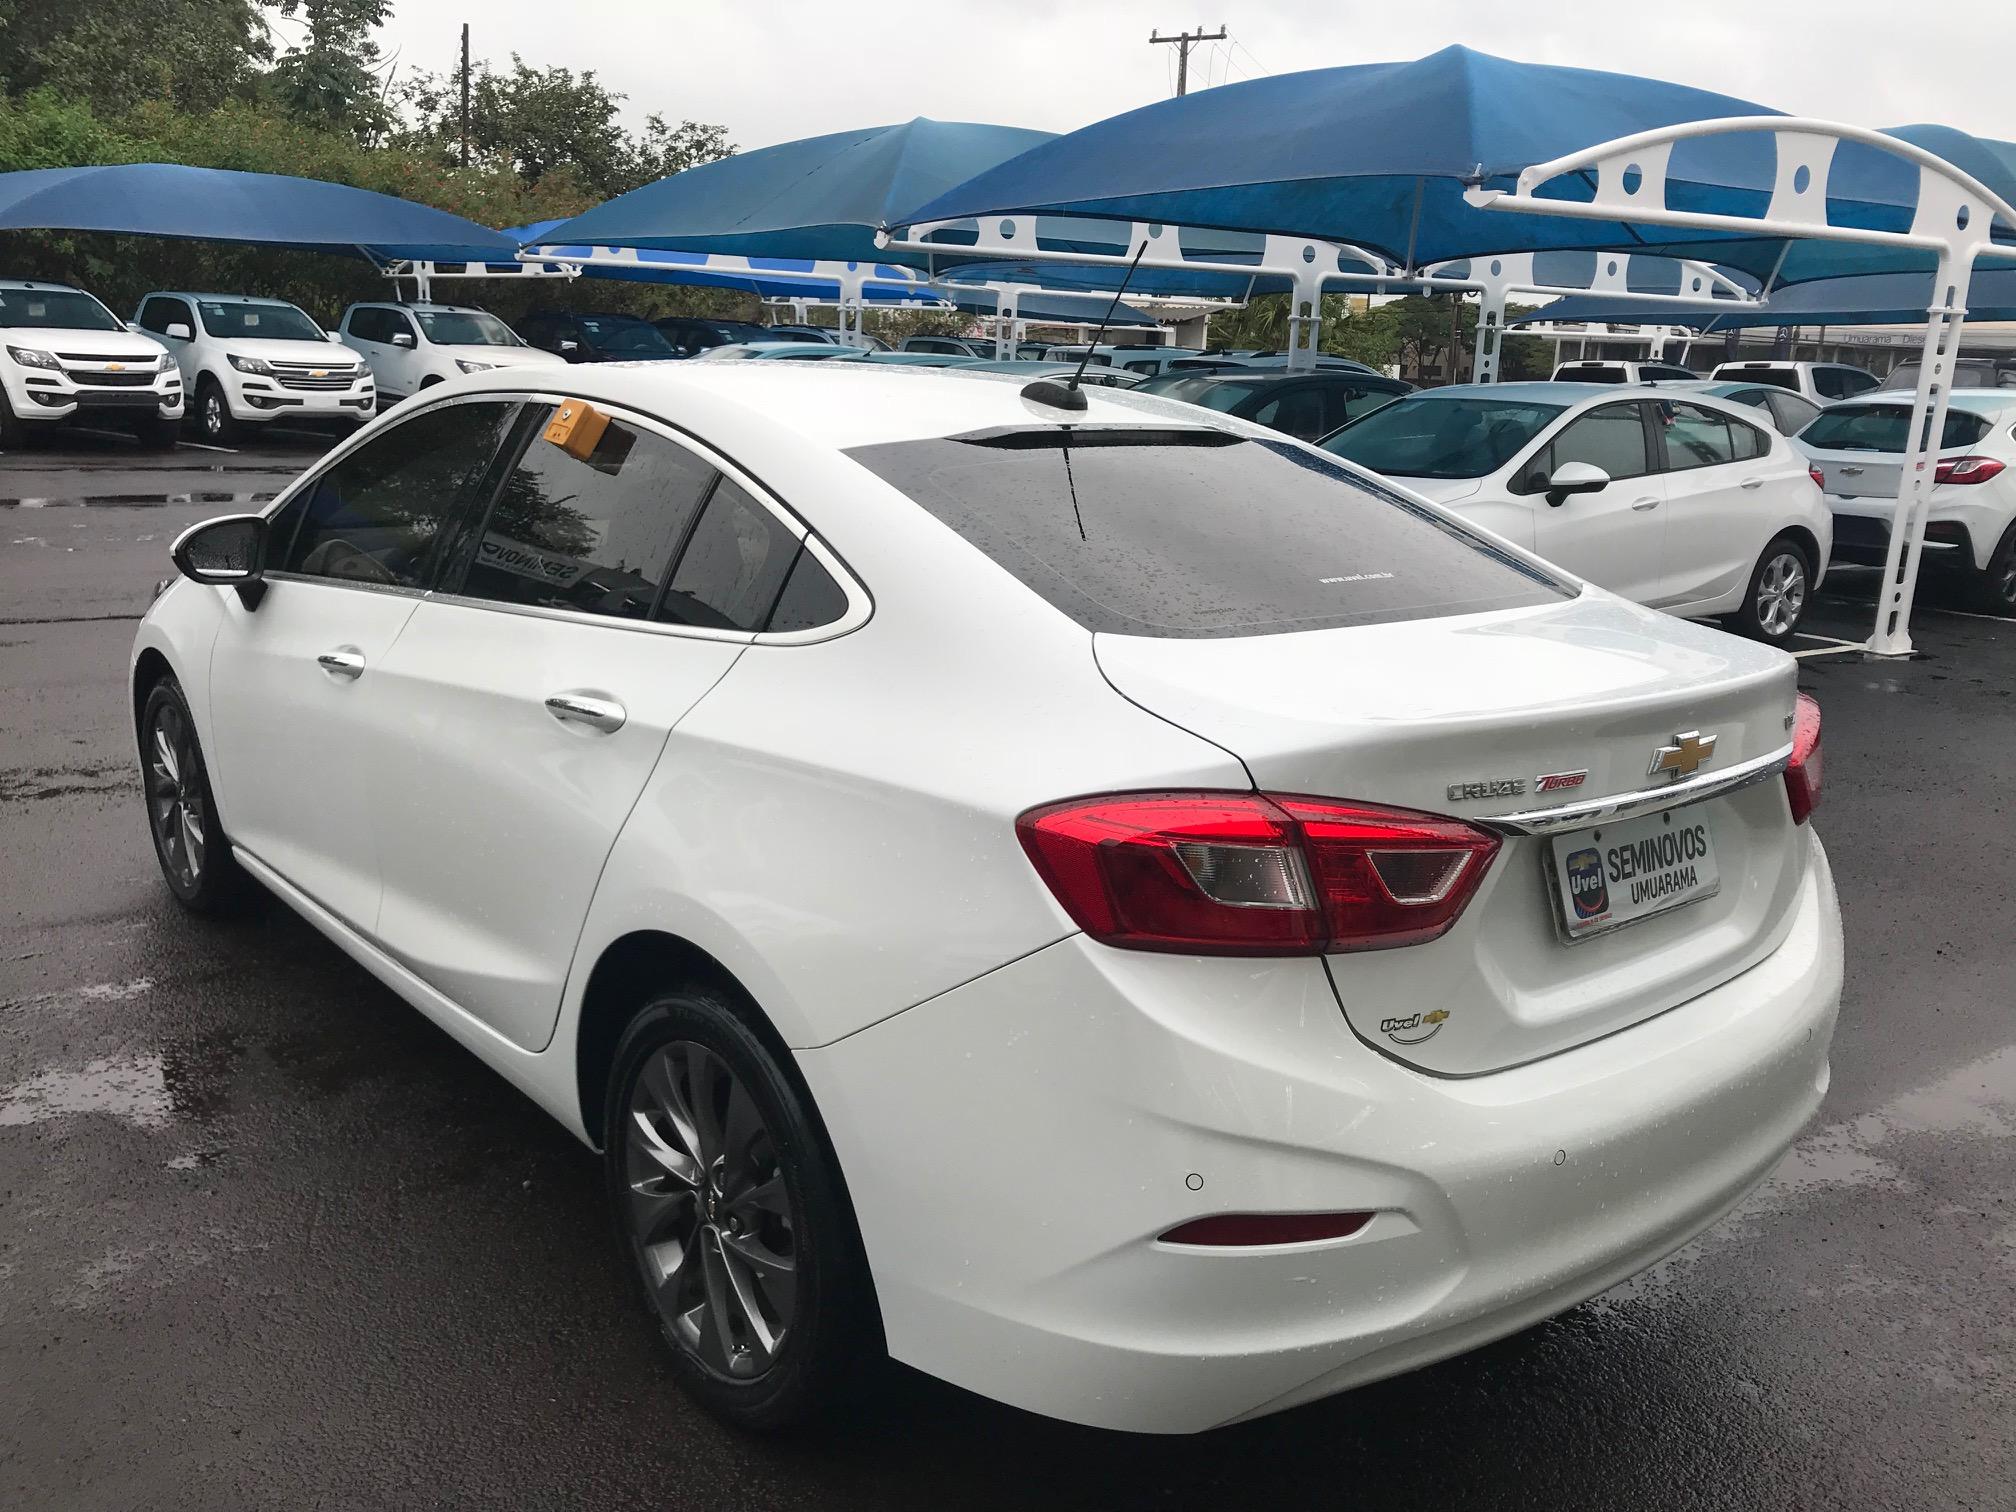 Chevrolet CRUZE TURBO 1.4 2017